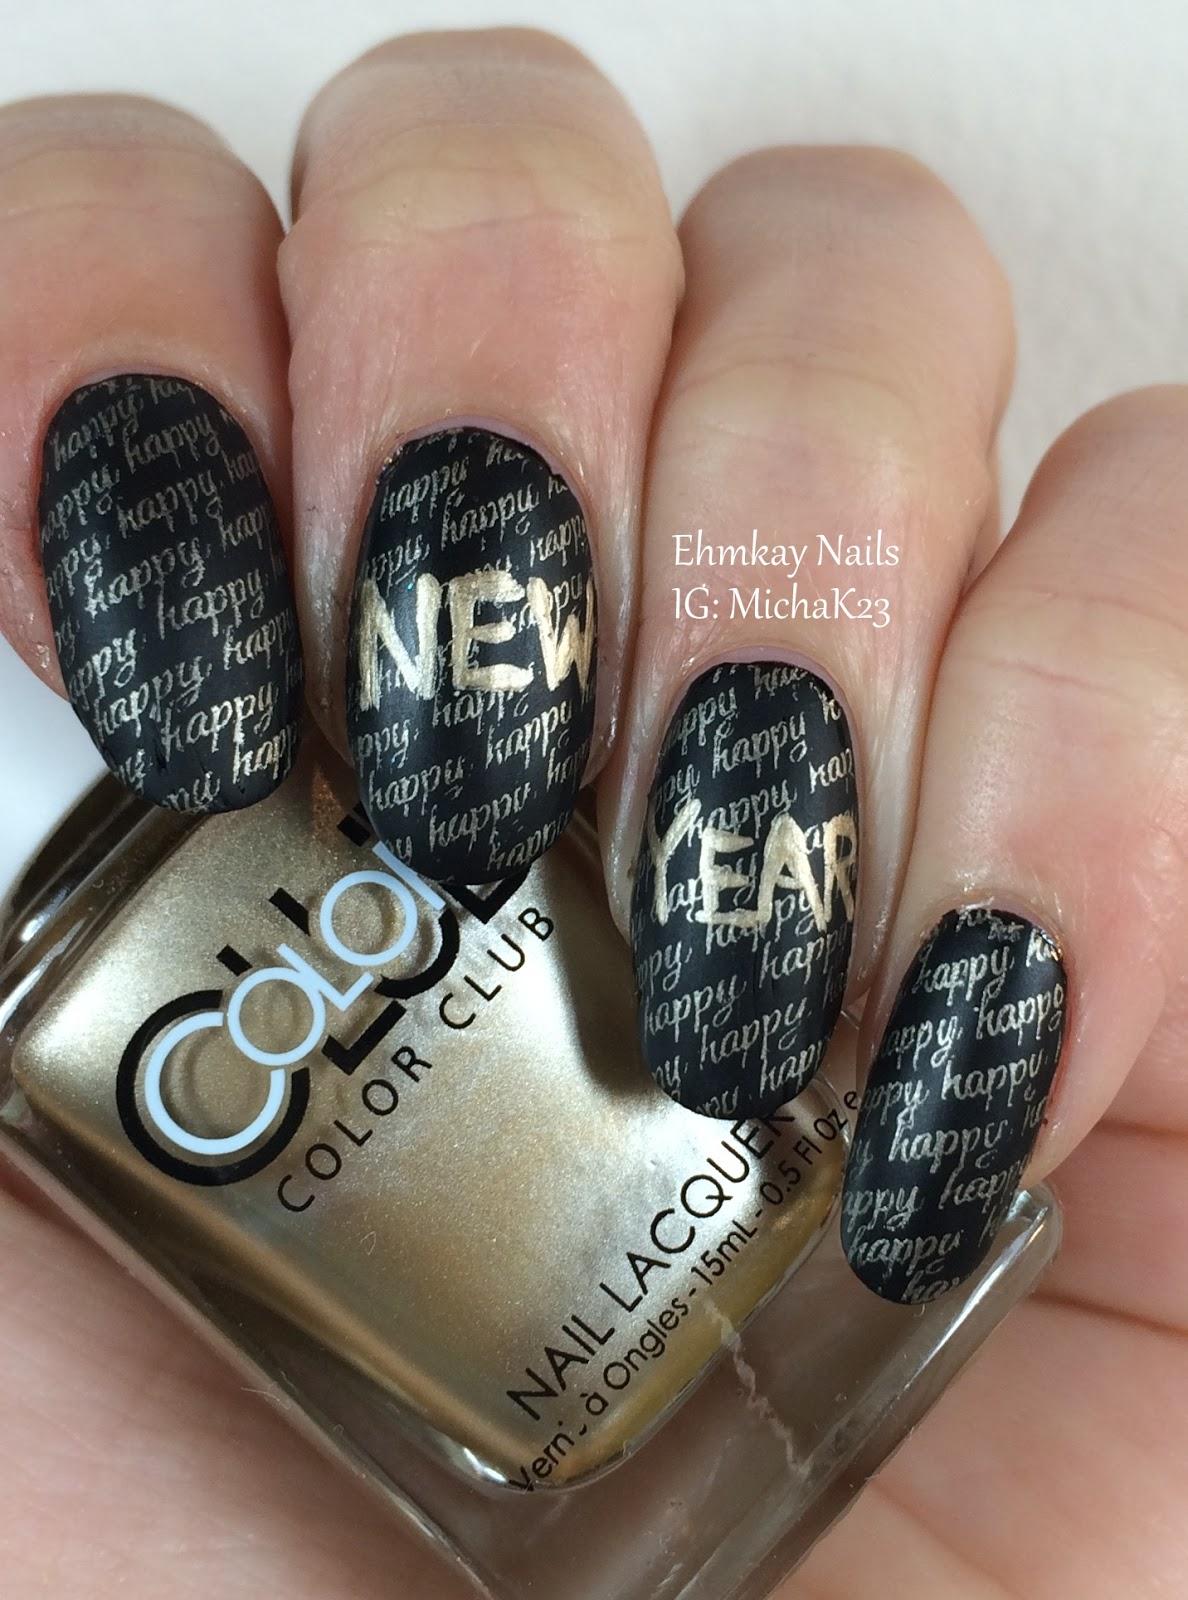 Nail Art Ideas » Nail Art Stamping Designs - Pictures of Nail Art ...